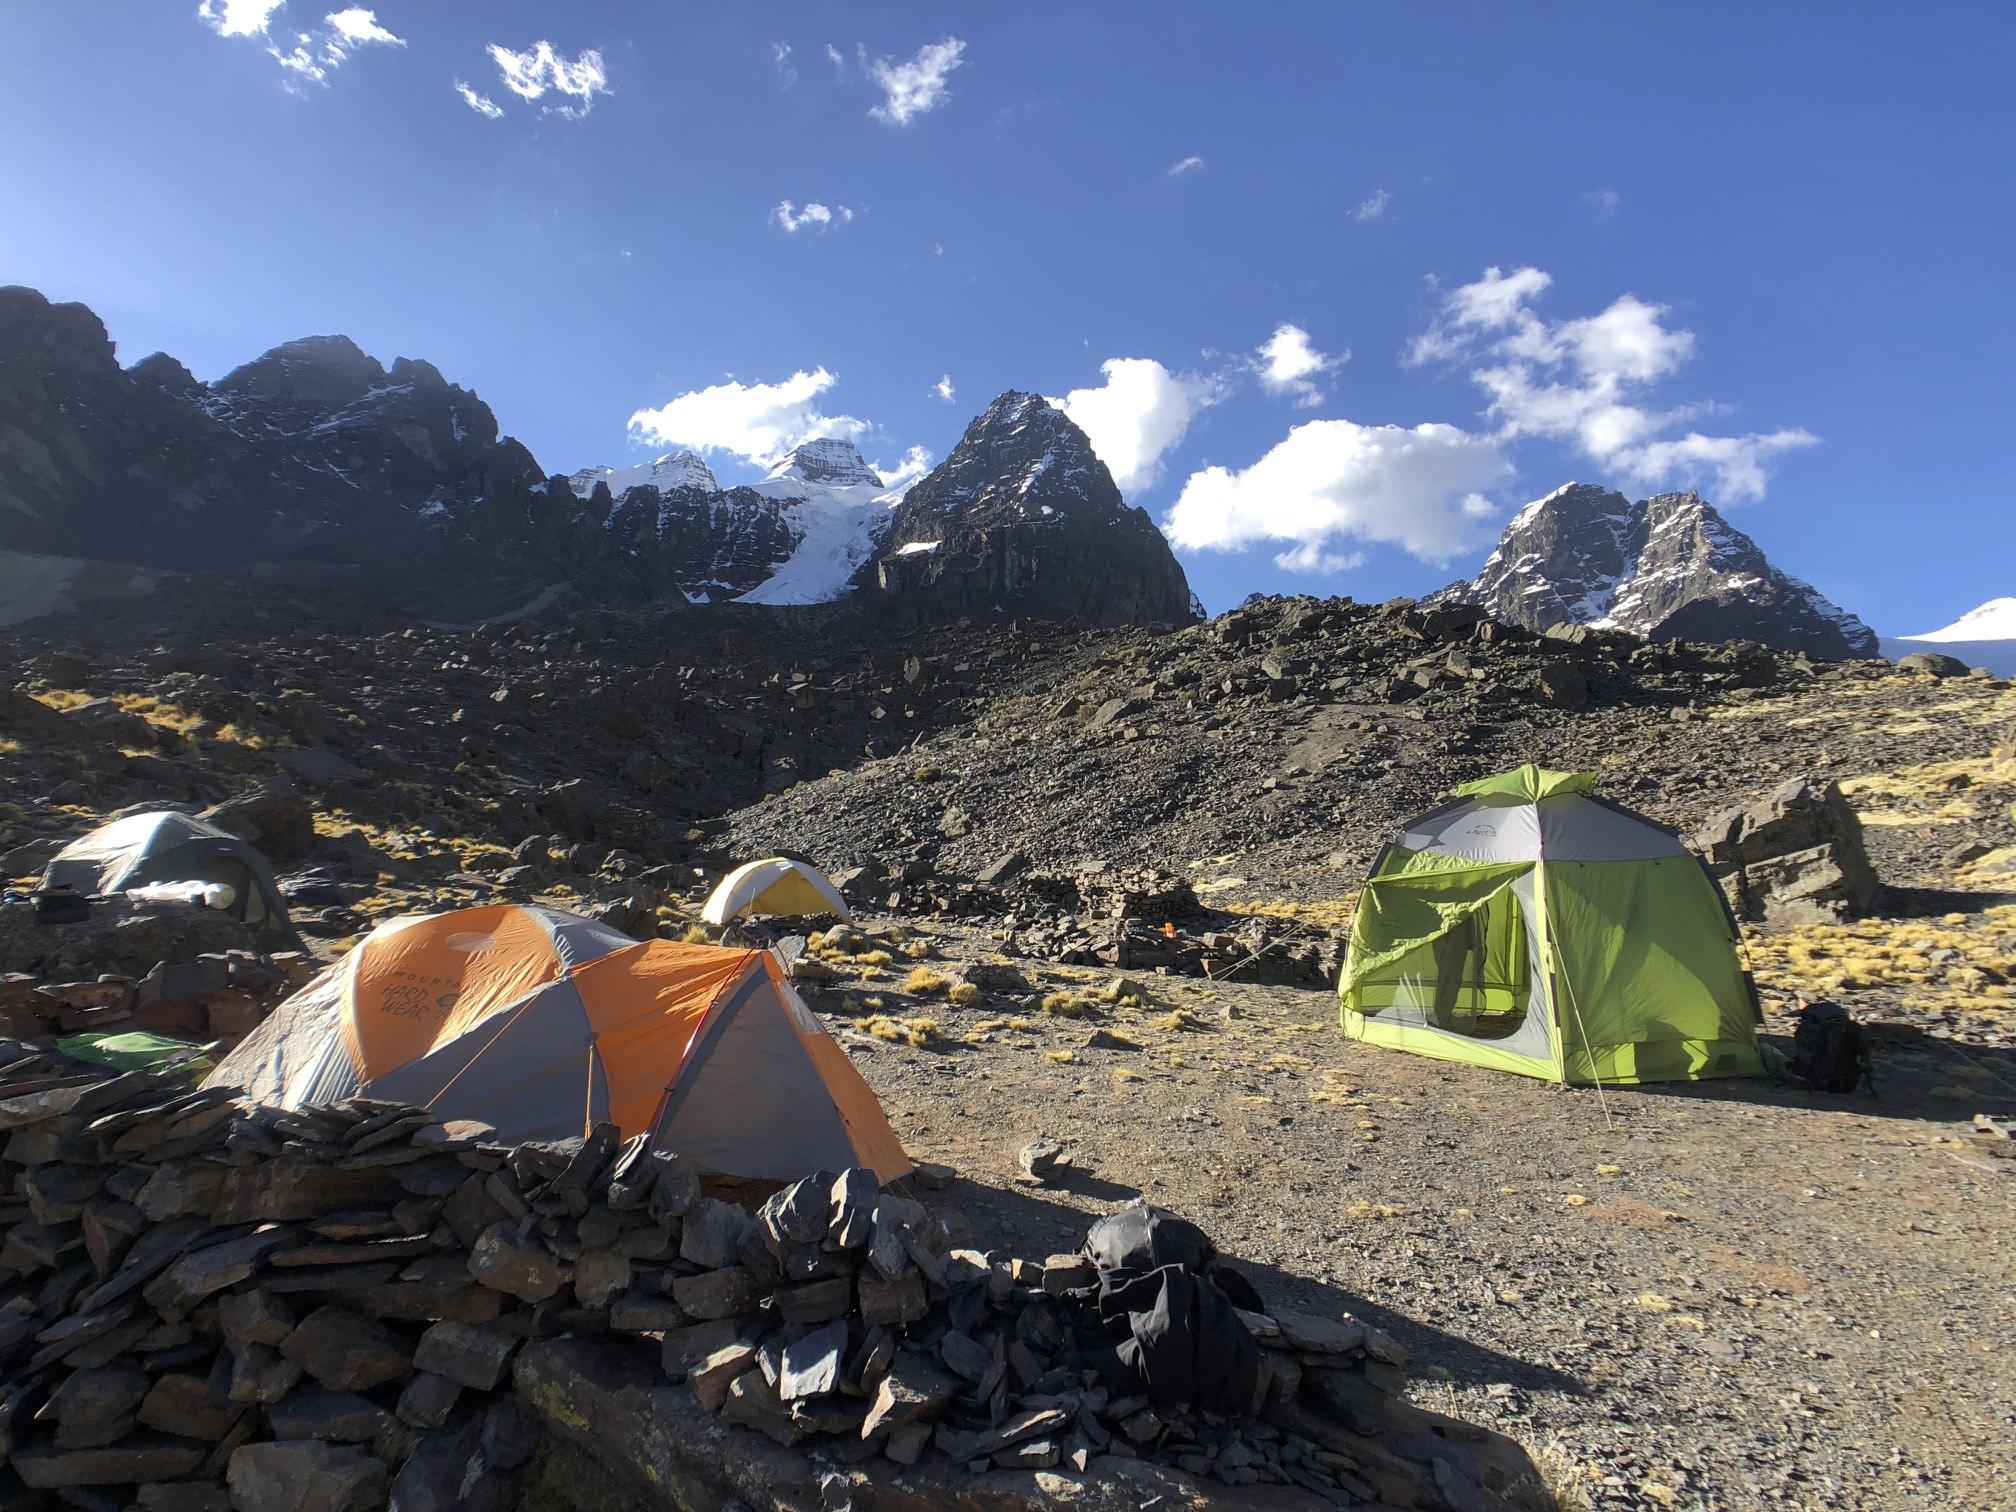 Basecamp for Pequeno Alpamayo and Condoriri